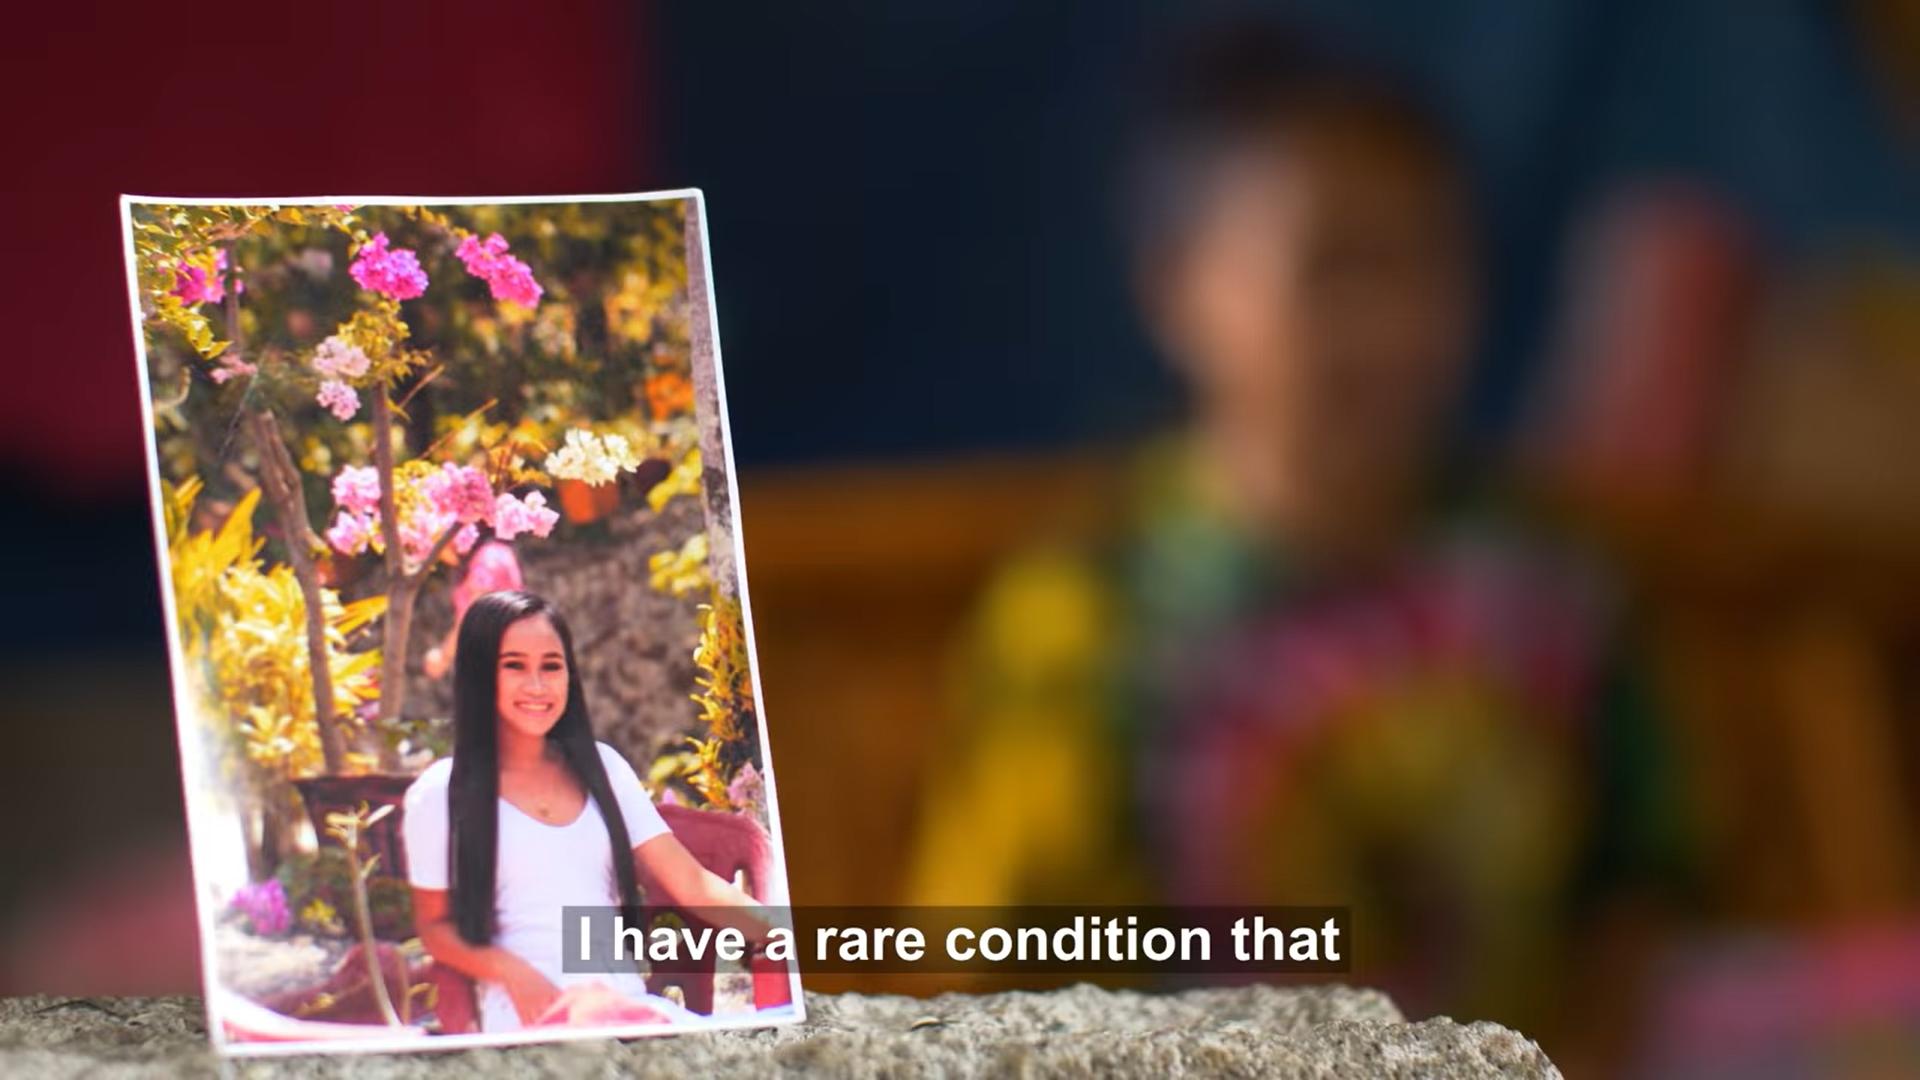 Penyakit Langka Jadi Alasan Wajah Gadis Berusia 16 Tahun Terlihat 'Tua'